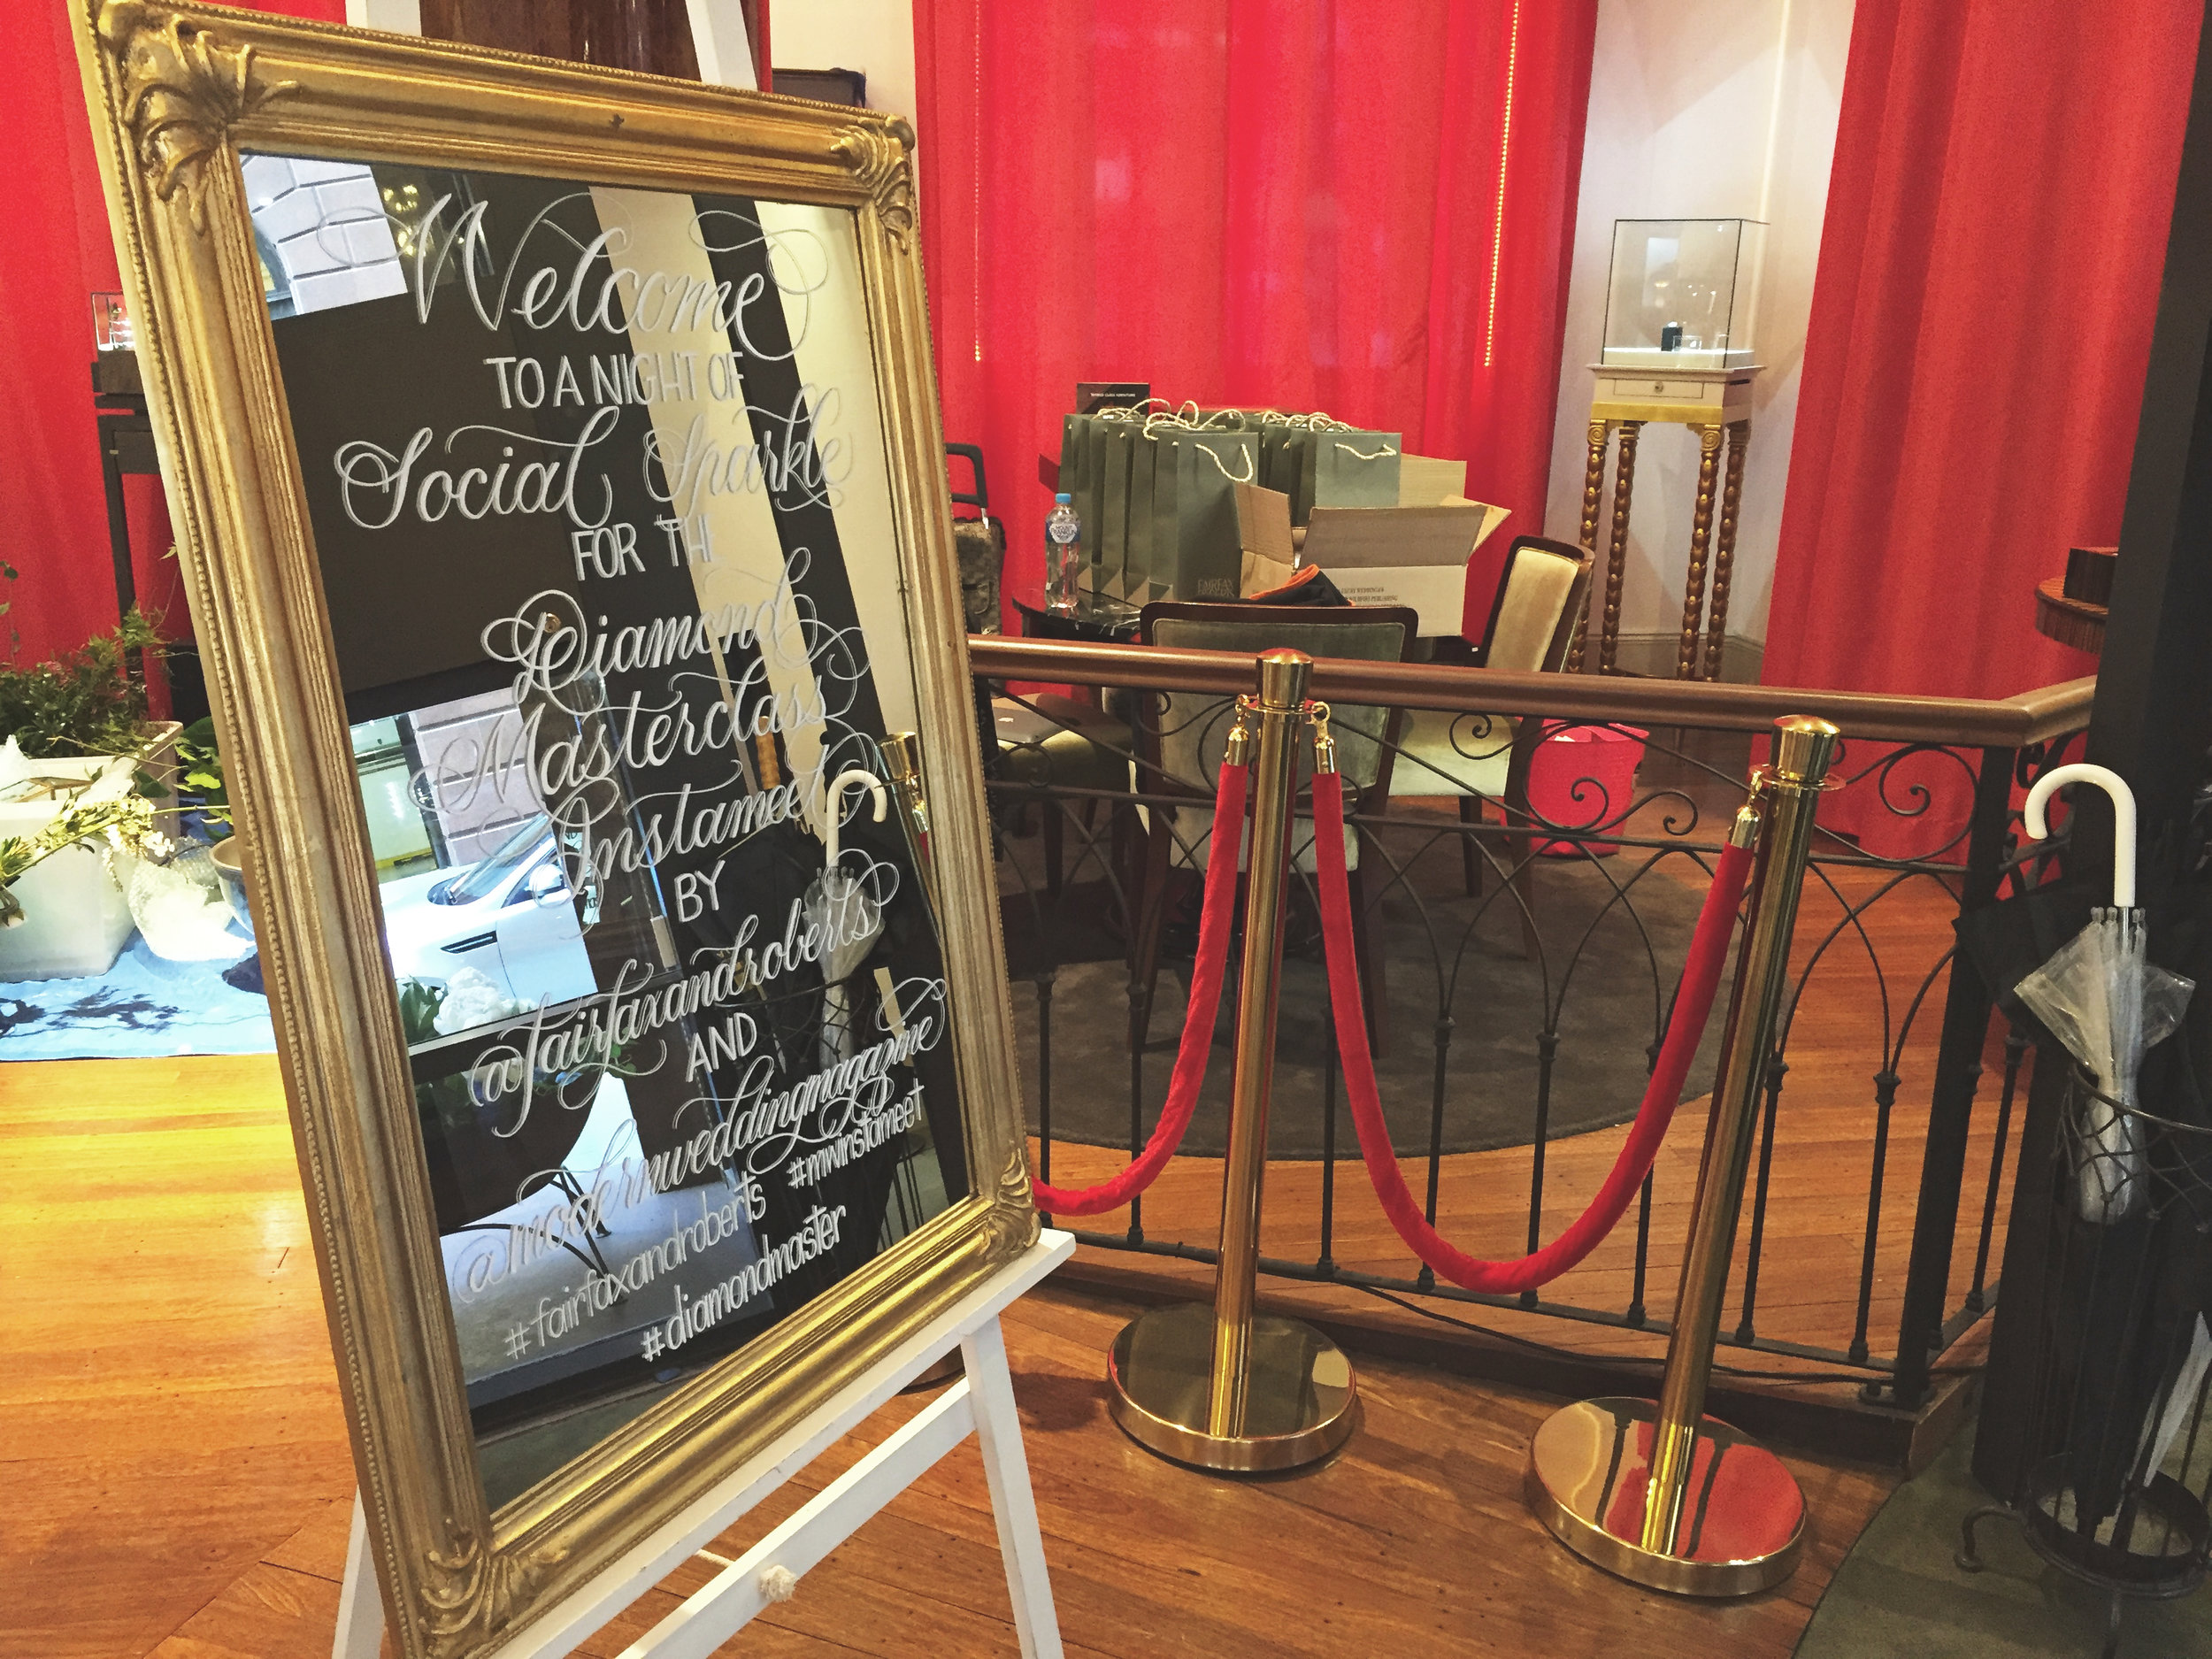 Handwritten calligraphy mirror for Fairfax and Robert x Modern Wedding Diamond Masterclass event in Sydney